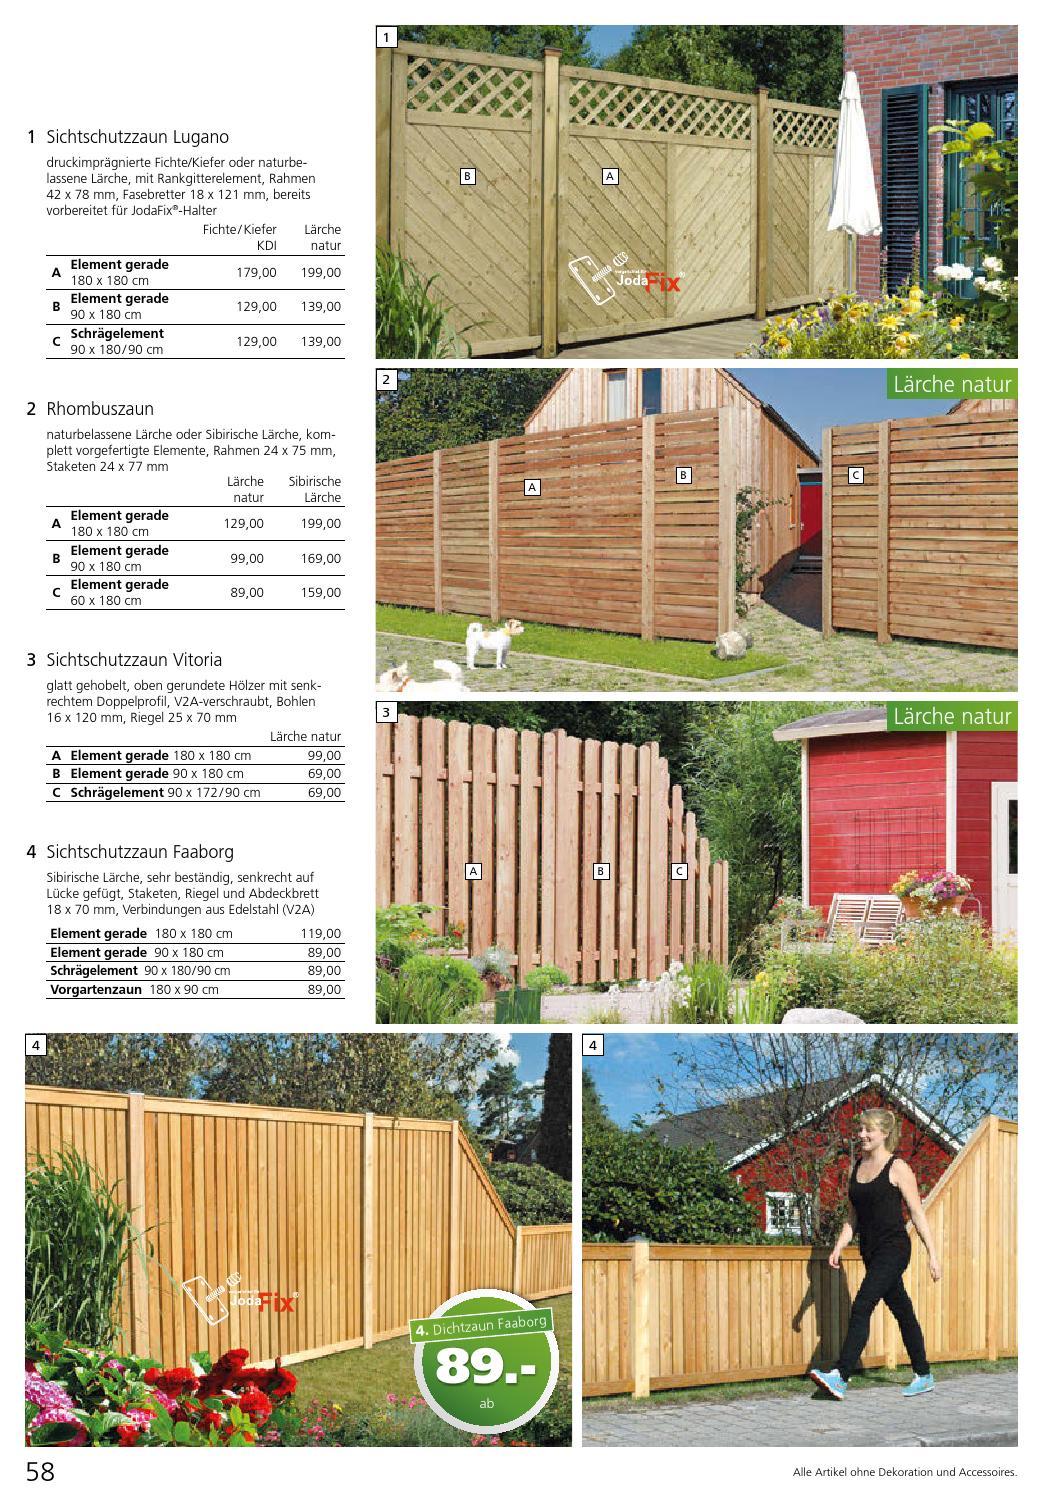 Krause Gartenkatalog 2016 By Fullhaus Issuu